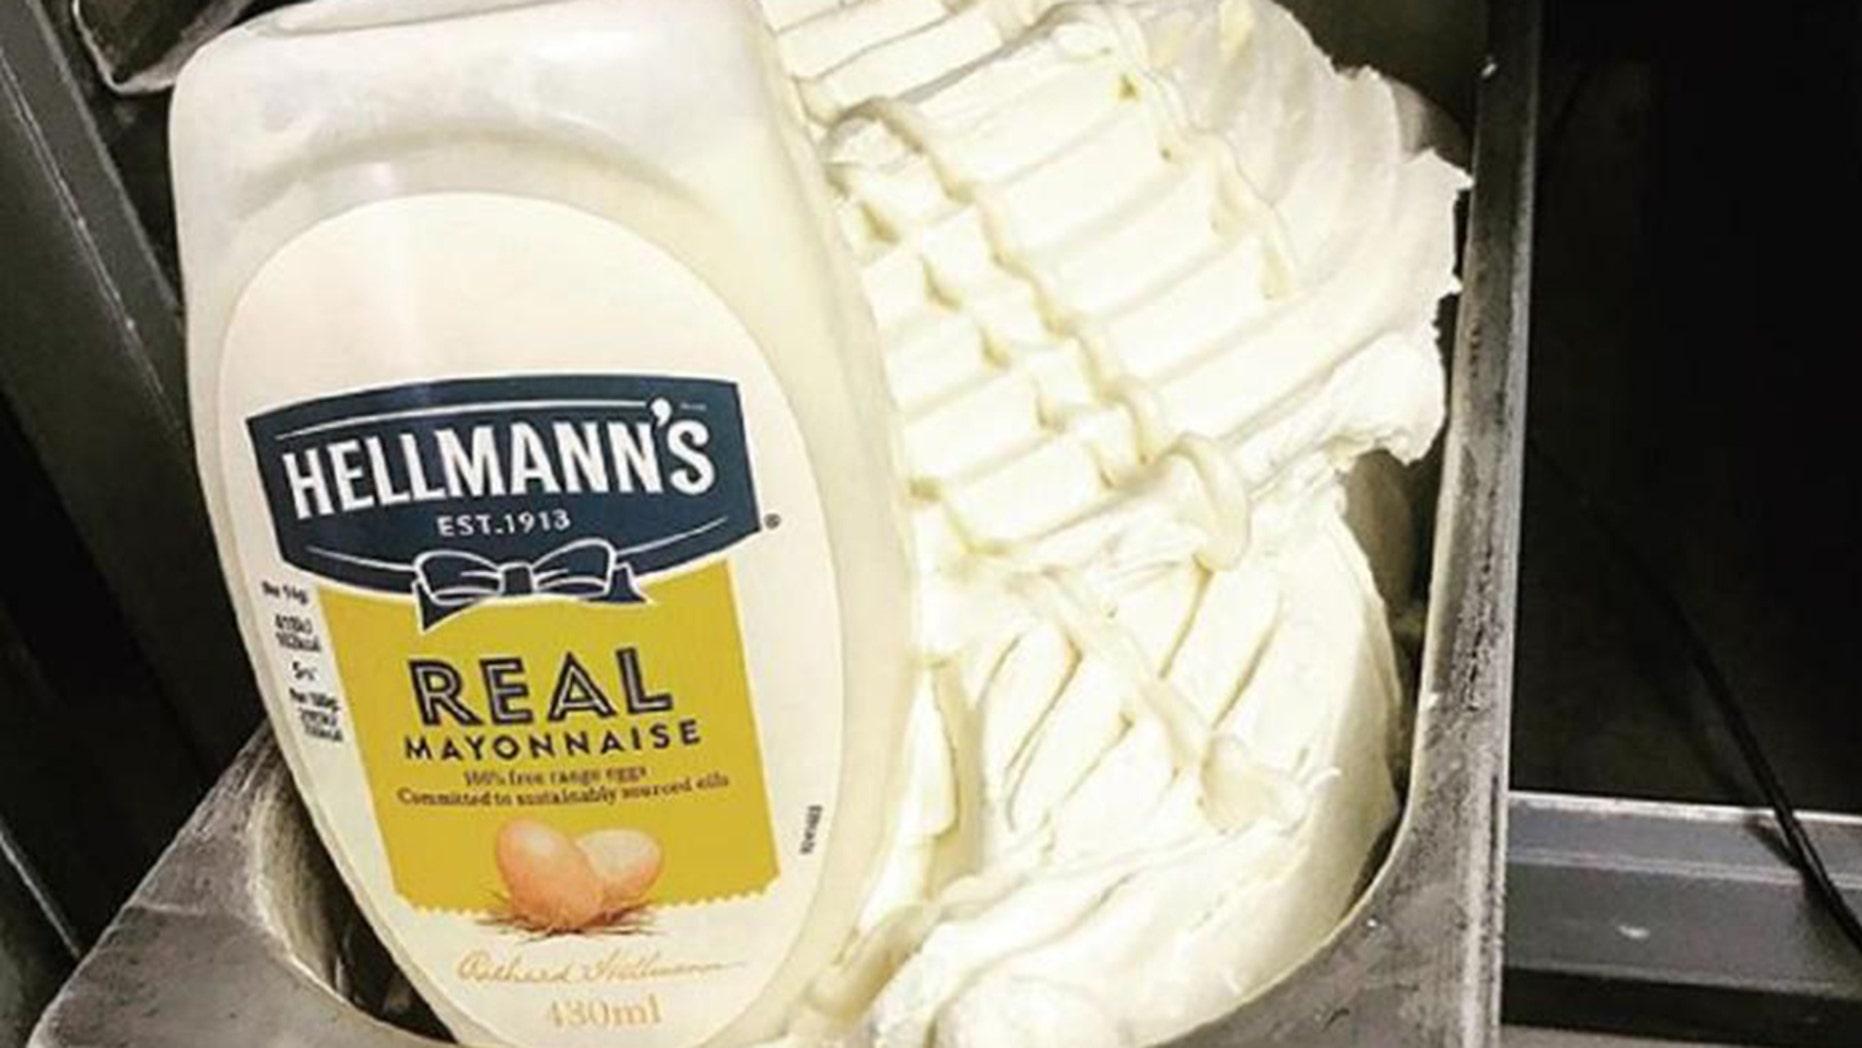 ICE artisan ice cream in Falkirk, Scotland, is selling the bizarre ice cream.